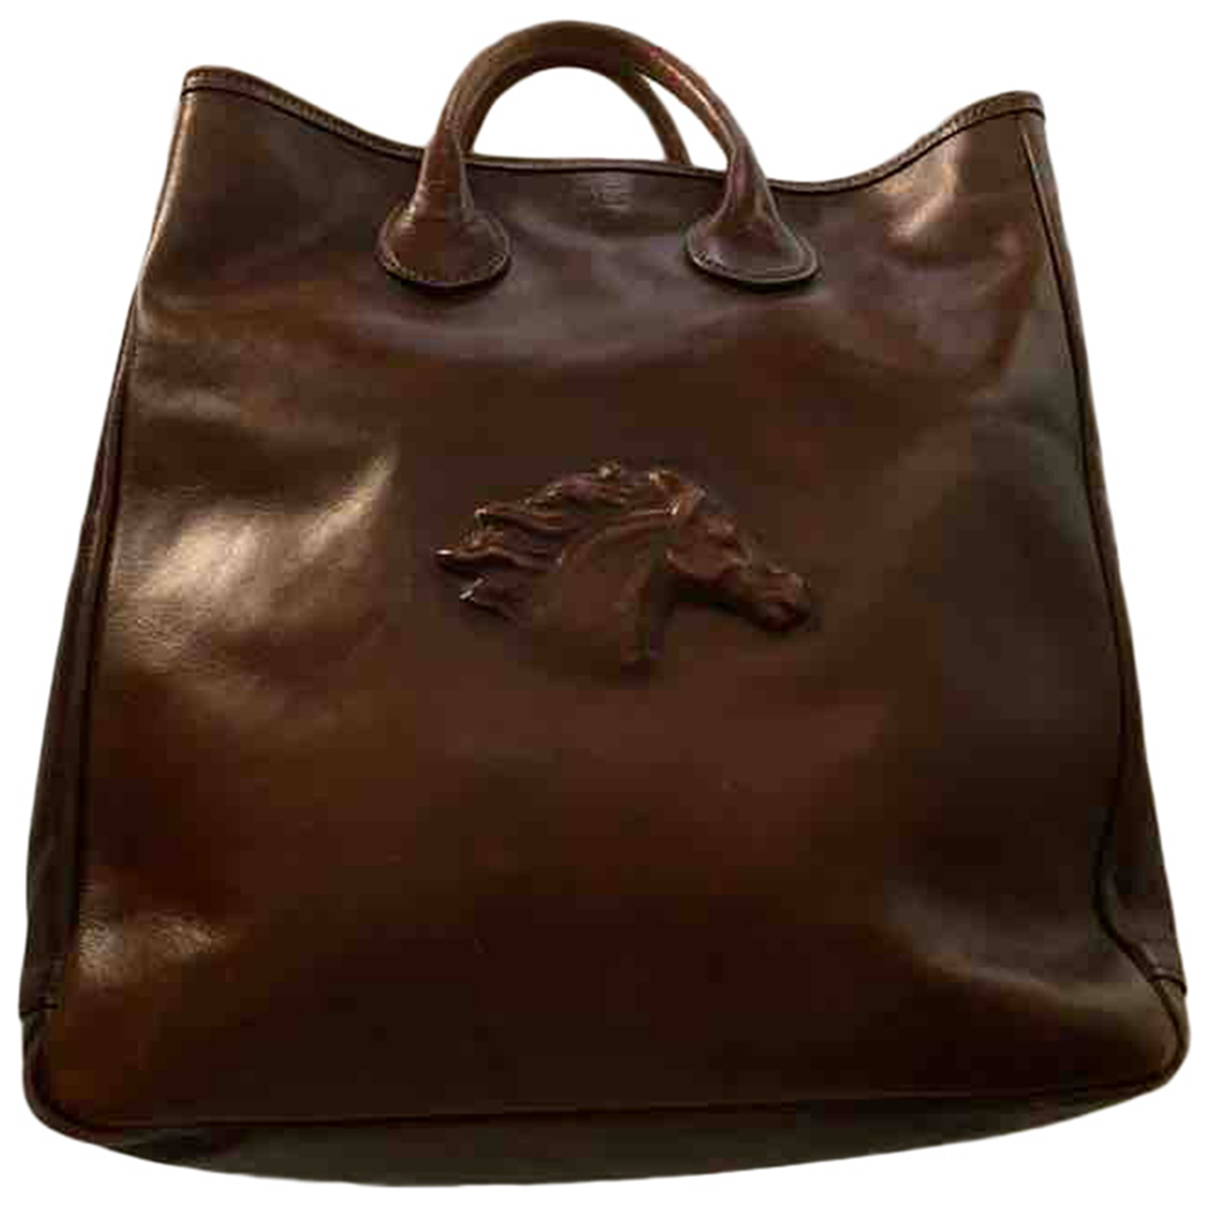 Ritz Saddler - Sac a main   pour femme en cuir - marron